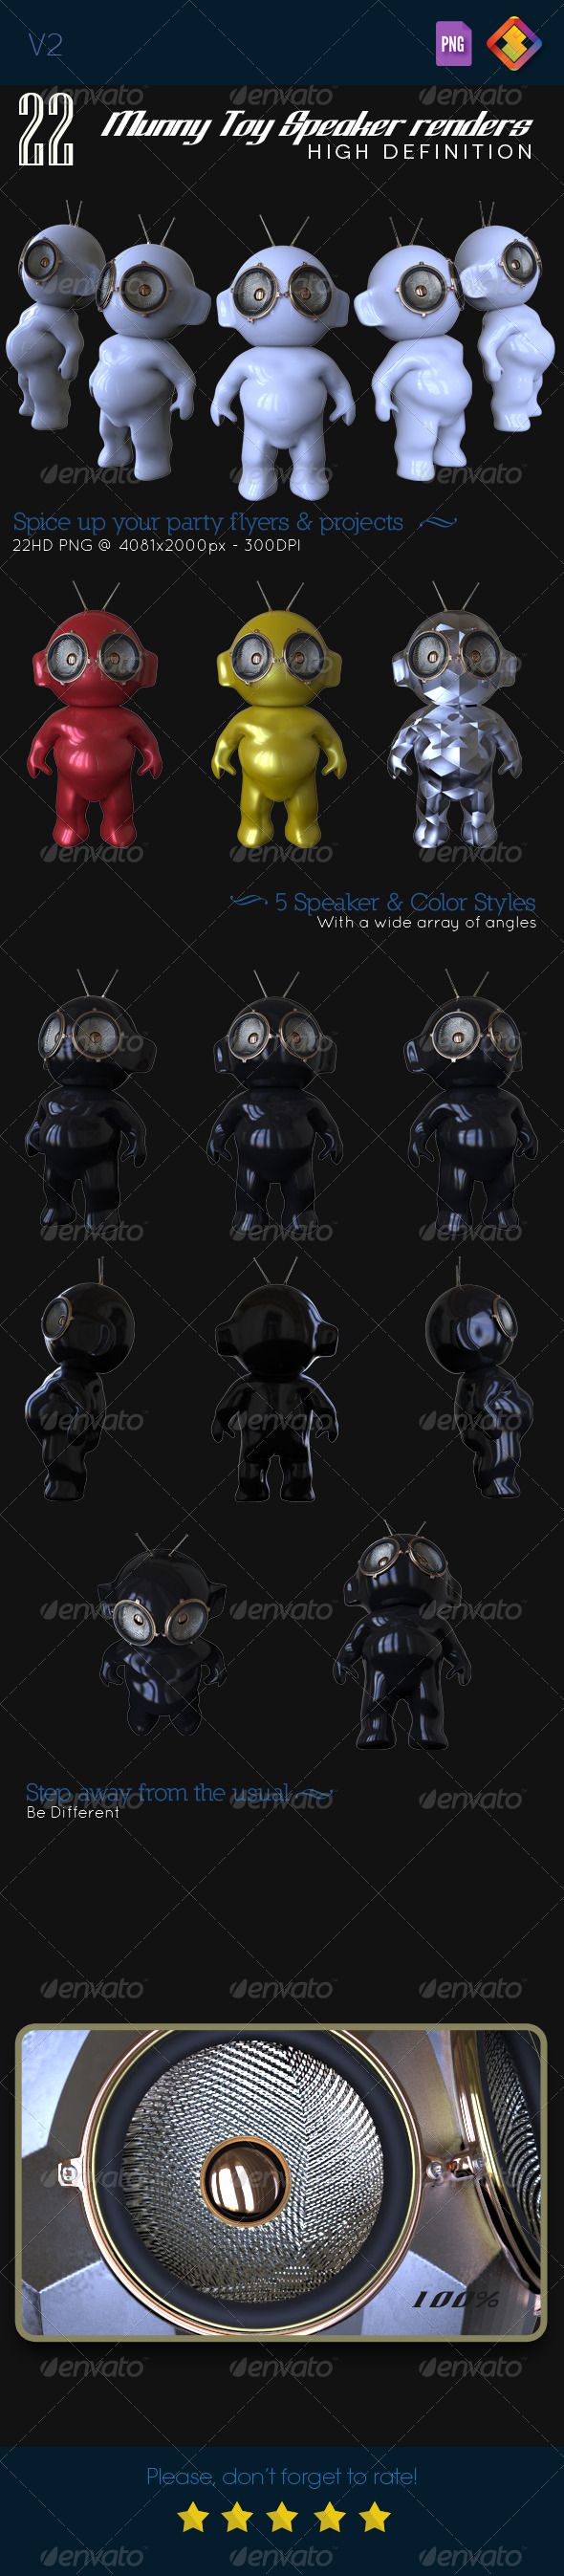 GraphicRiver Munny Toy Speakers V.2 6477235